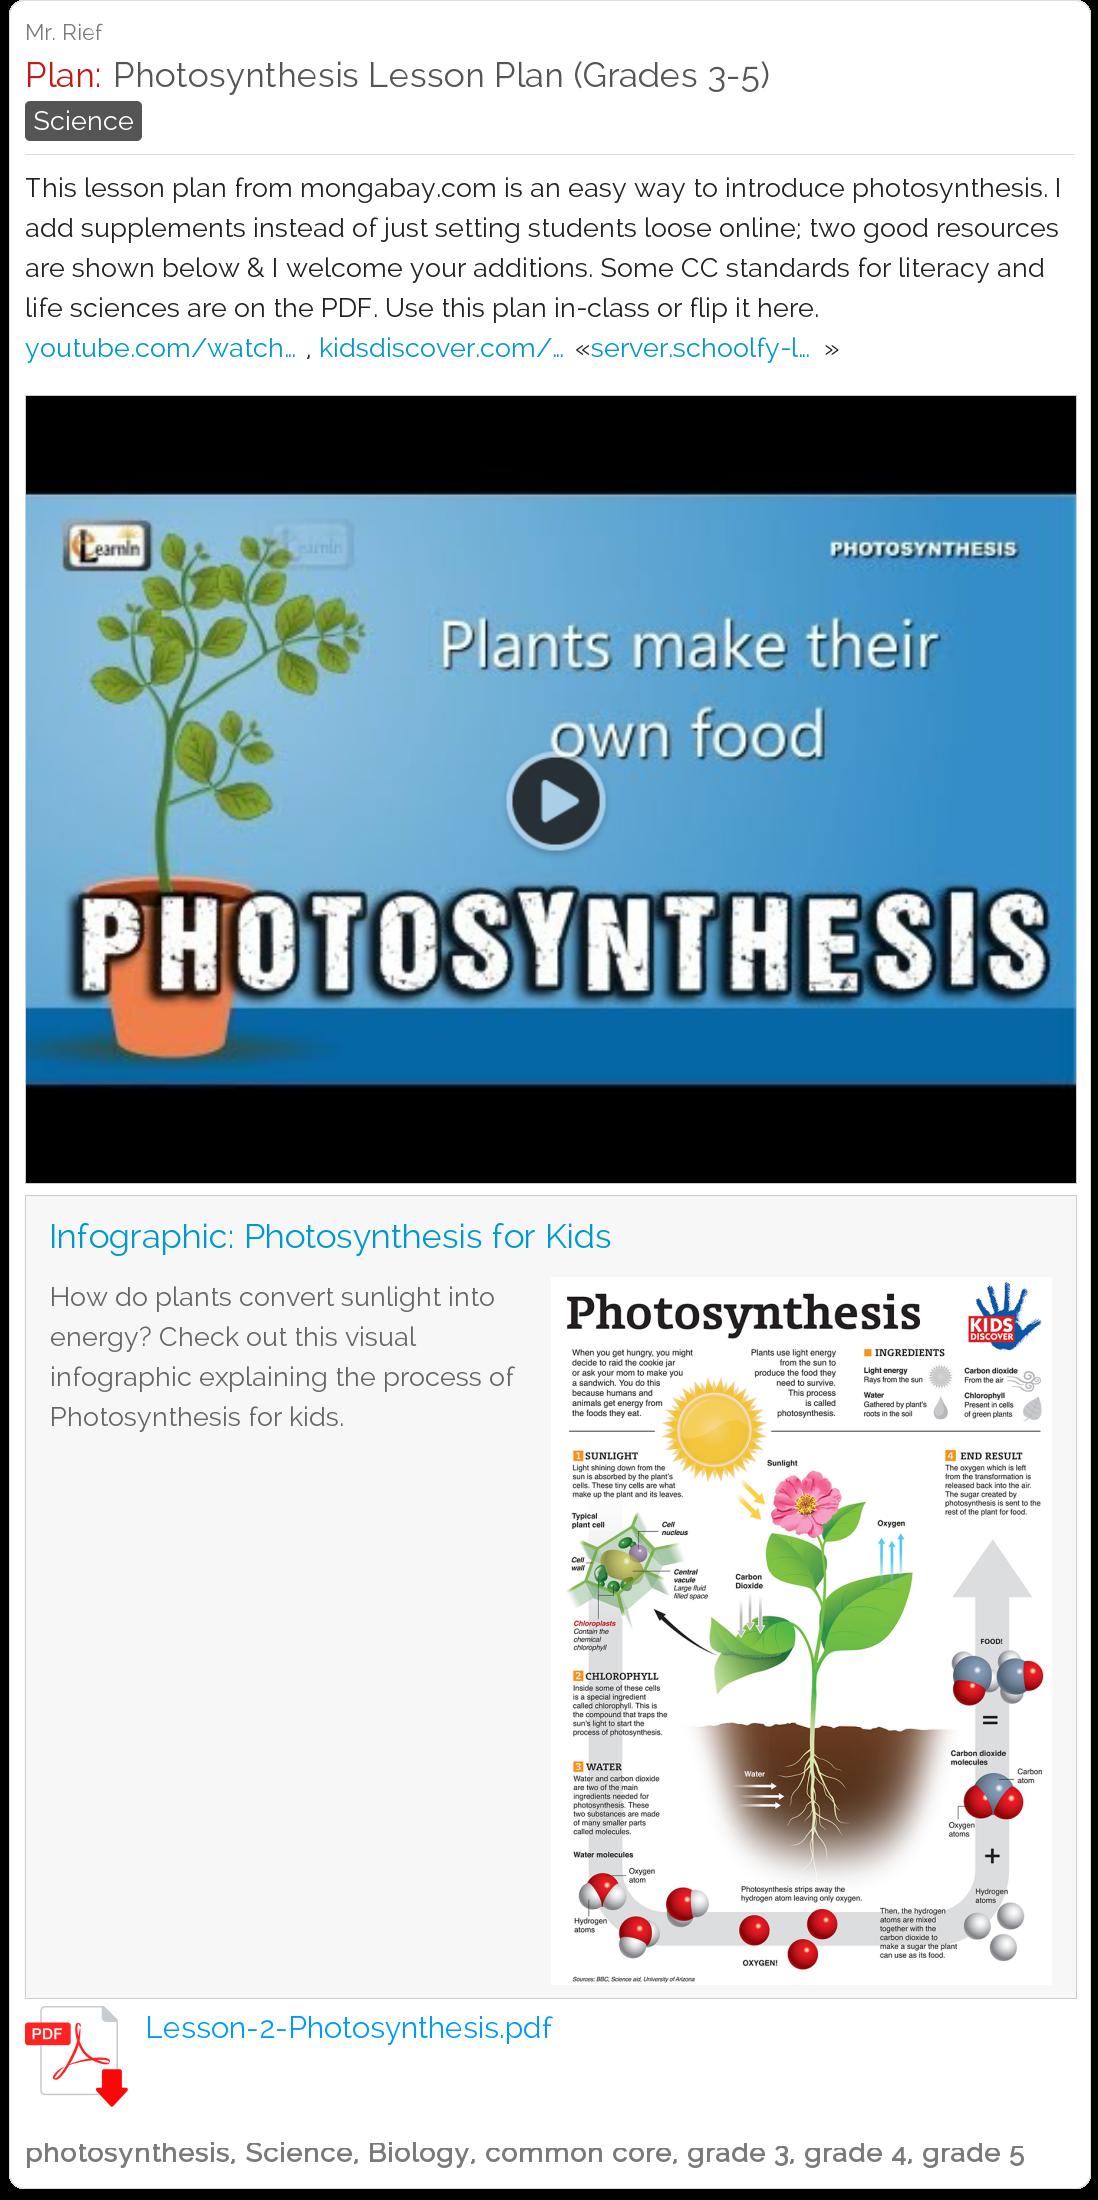 Free Photosynthesis Lesson Plan Grades 3 4 5